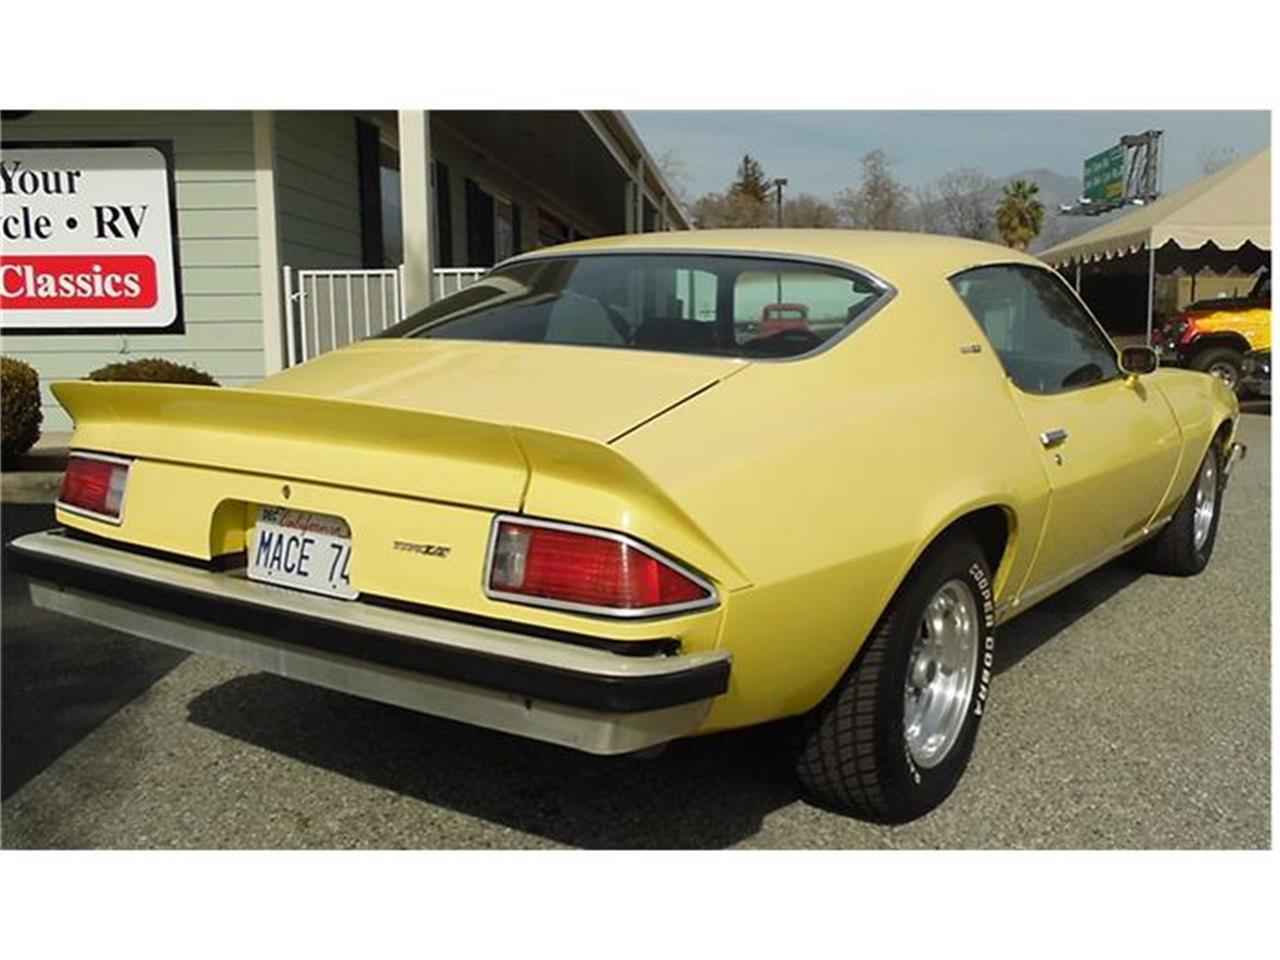 Large Picture of '74 Camaro located in California - $9,995.00 - GP98